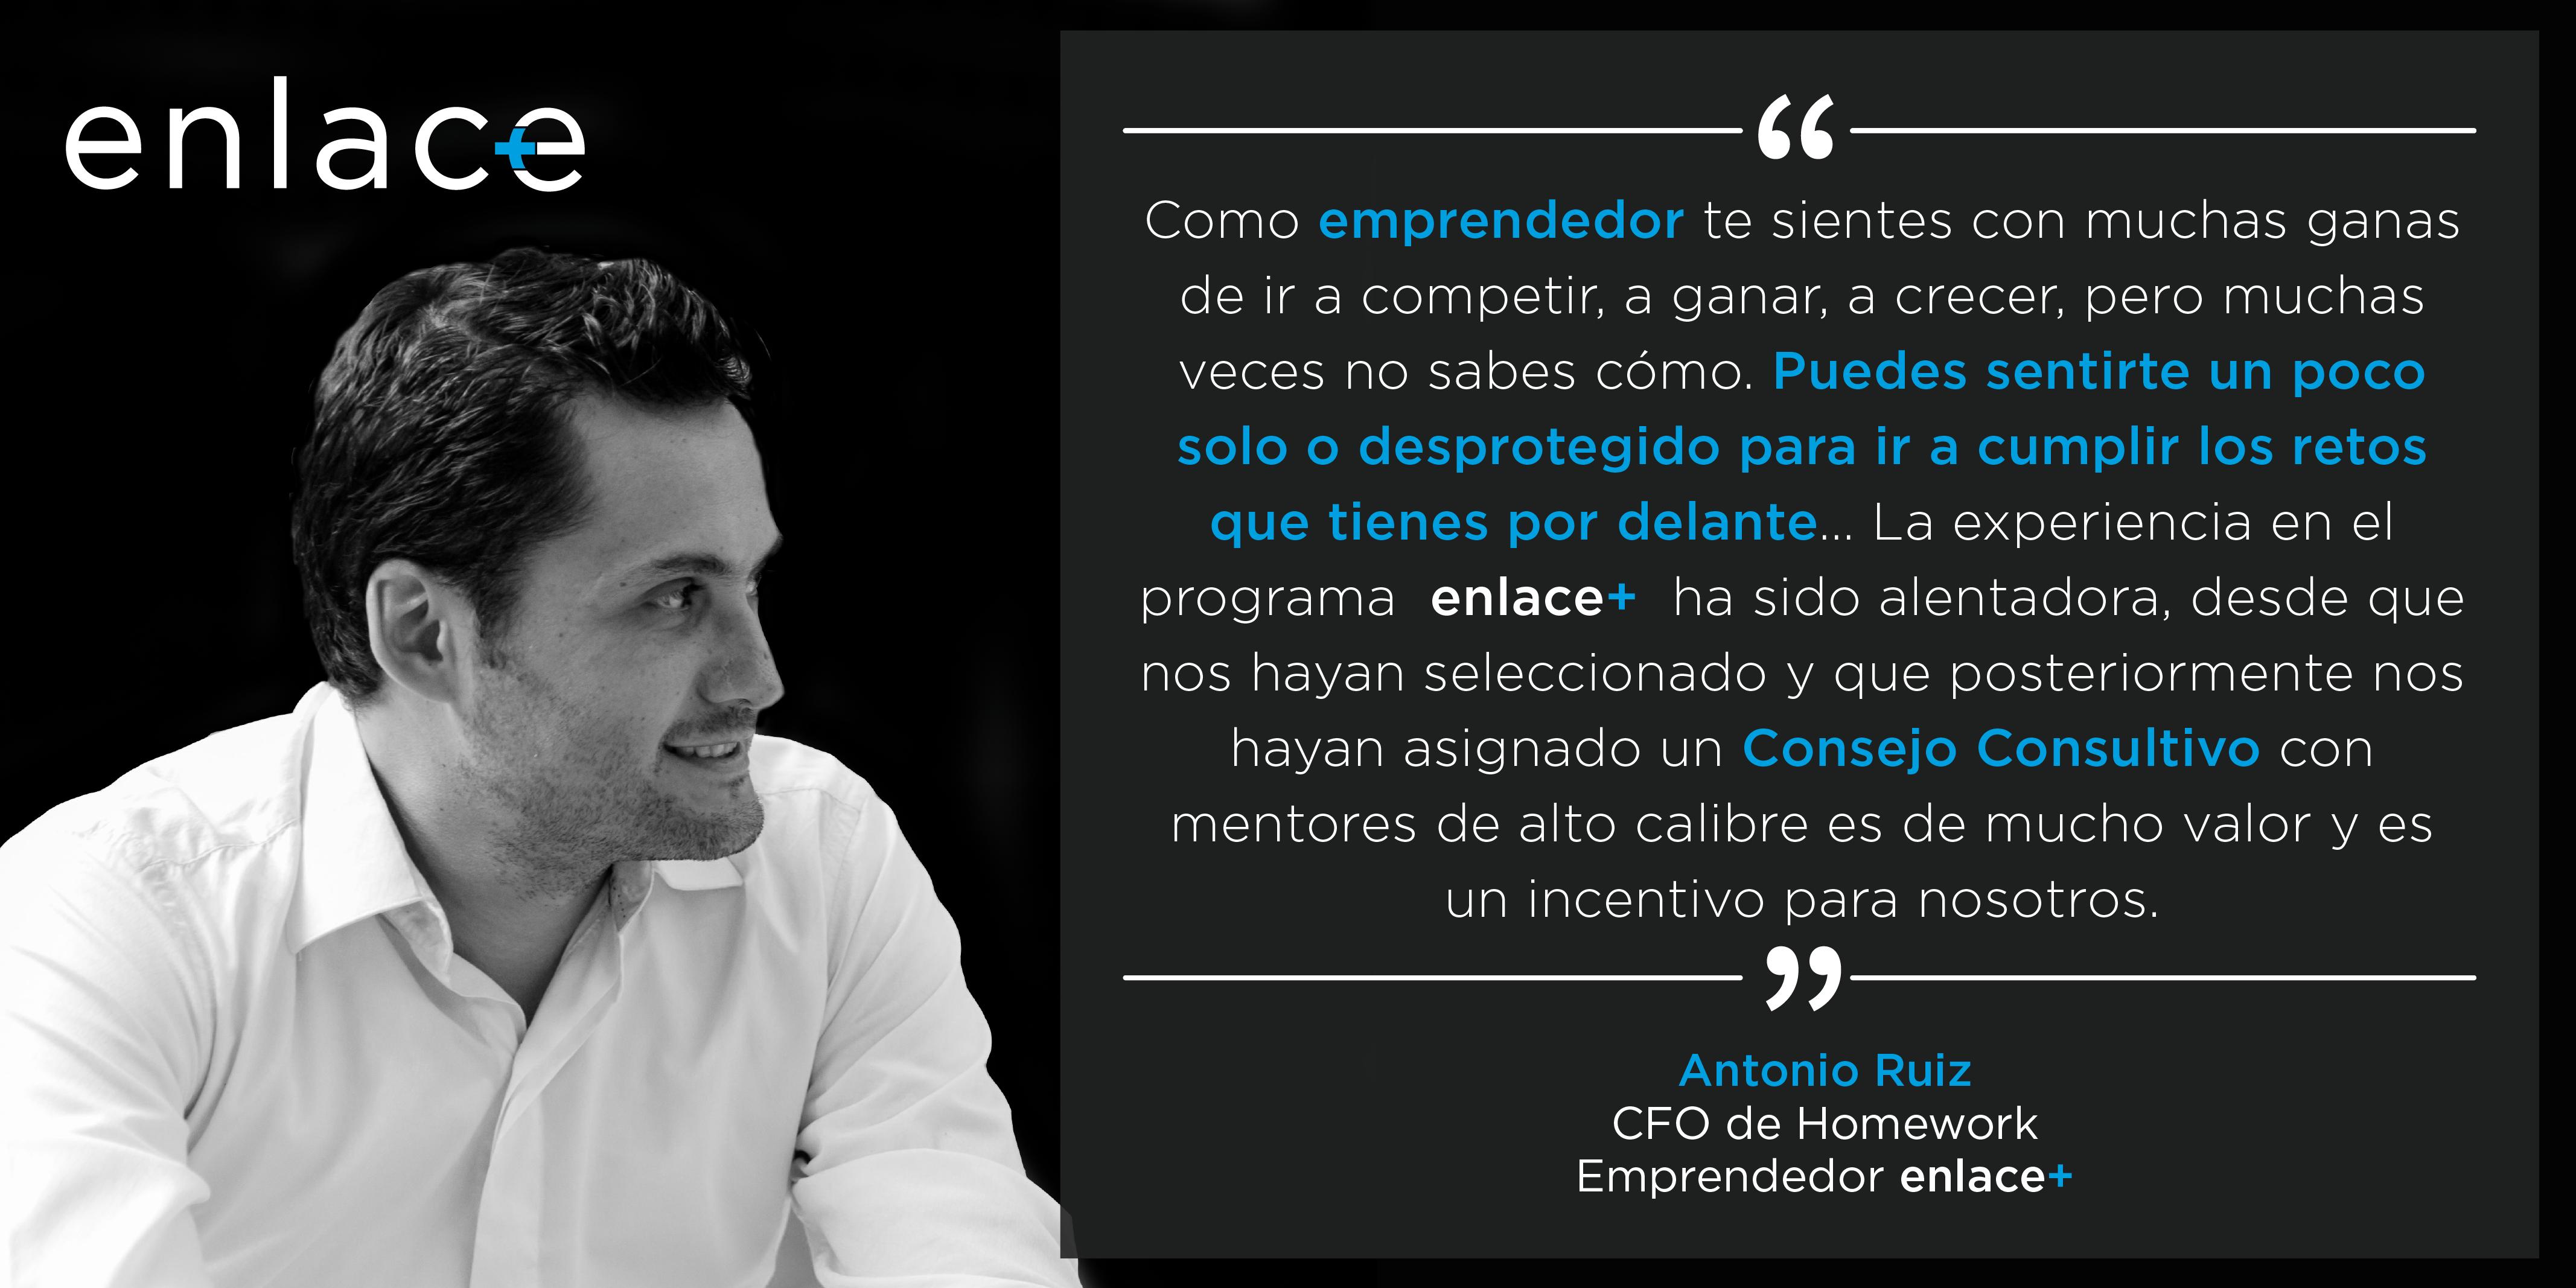 Antonio Twitter